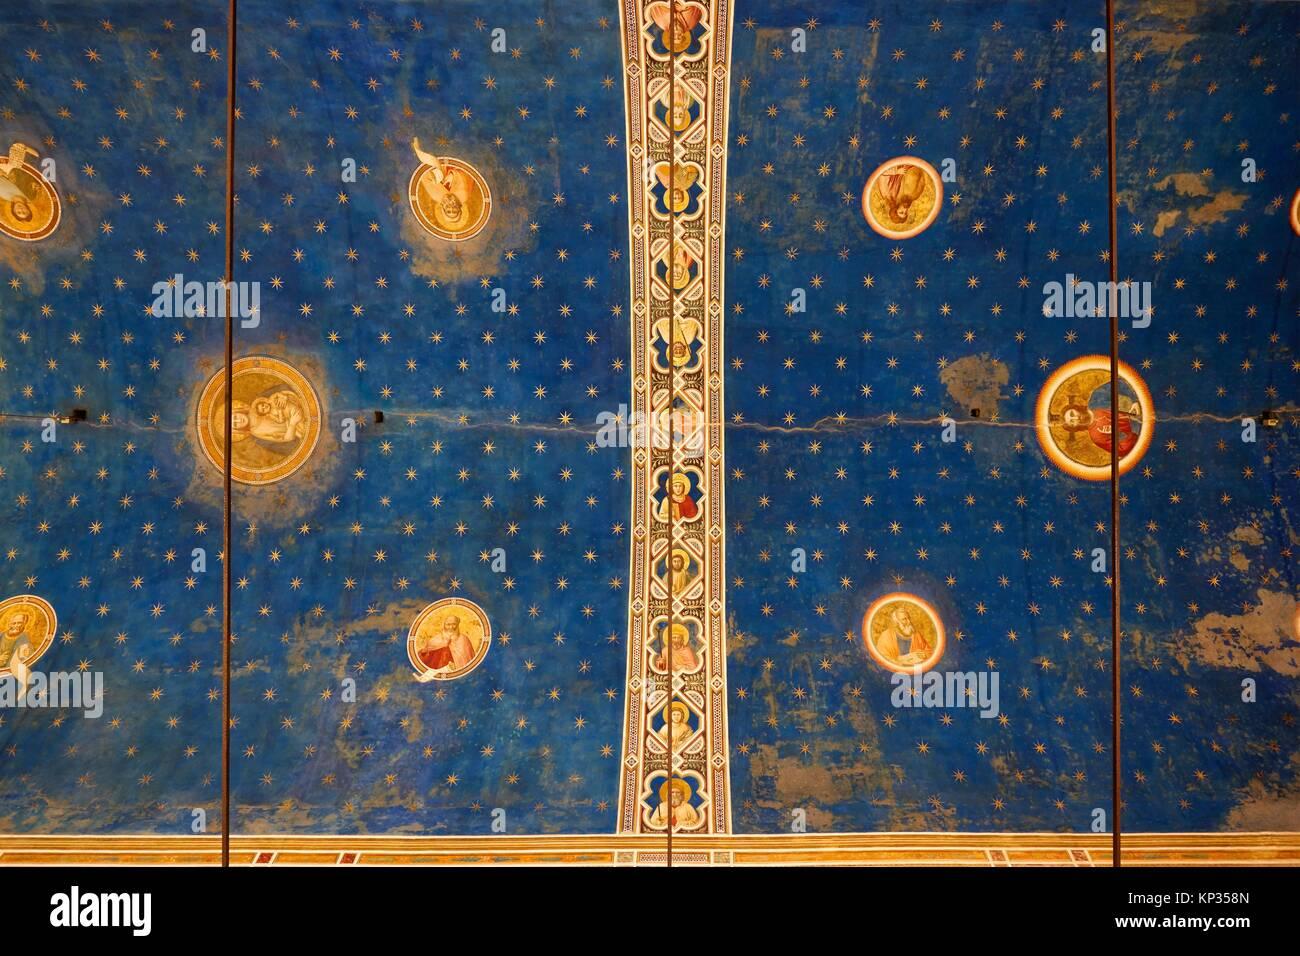 The interior of the Scrovegni Chapel in Padua, Italy, frescoed by Giotto. The Scrovegni Chapel is a church in Padua, Stock Photo